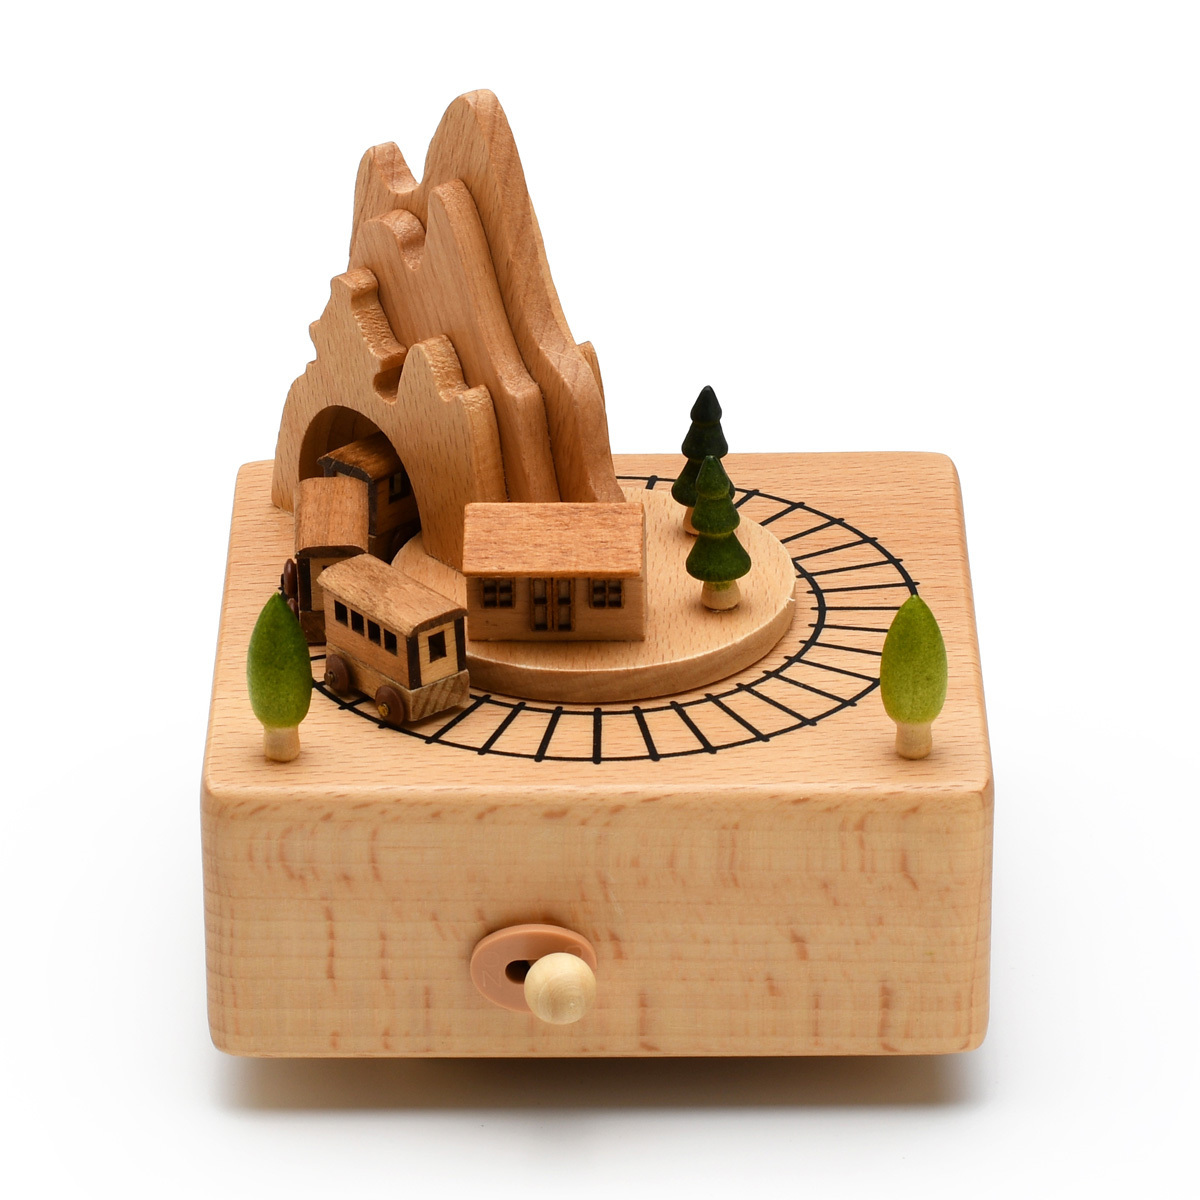 Animated 18 Note Musical Wooden Train on the Range Keepsake